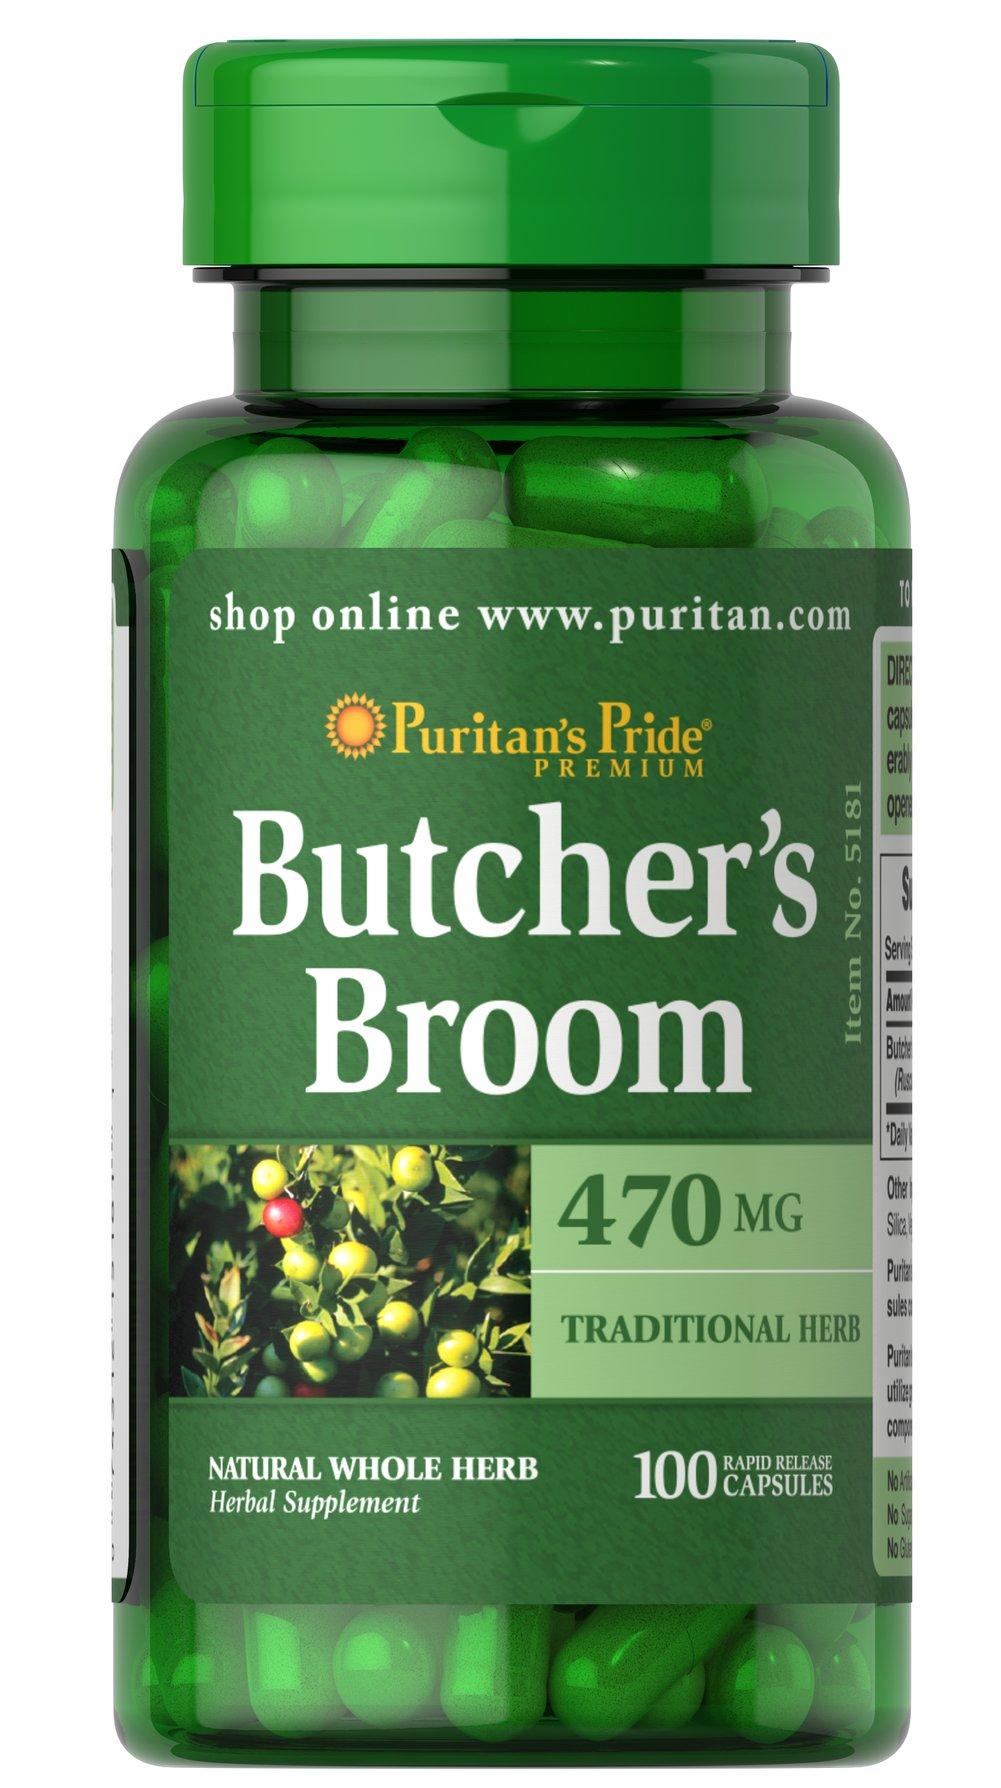 Find great deals on eBay for puritan's,+ followers on Twitter.